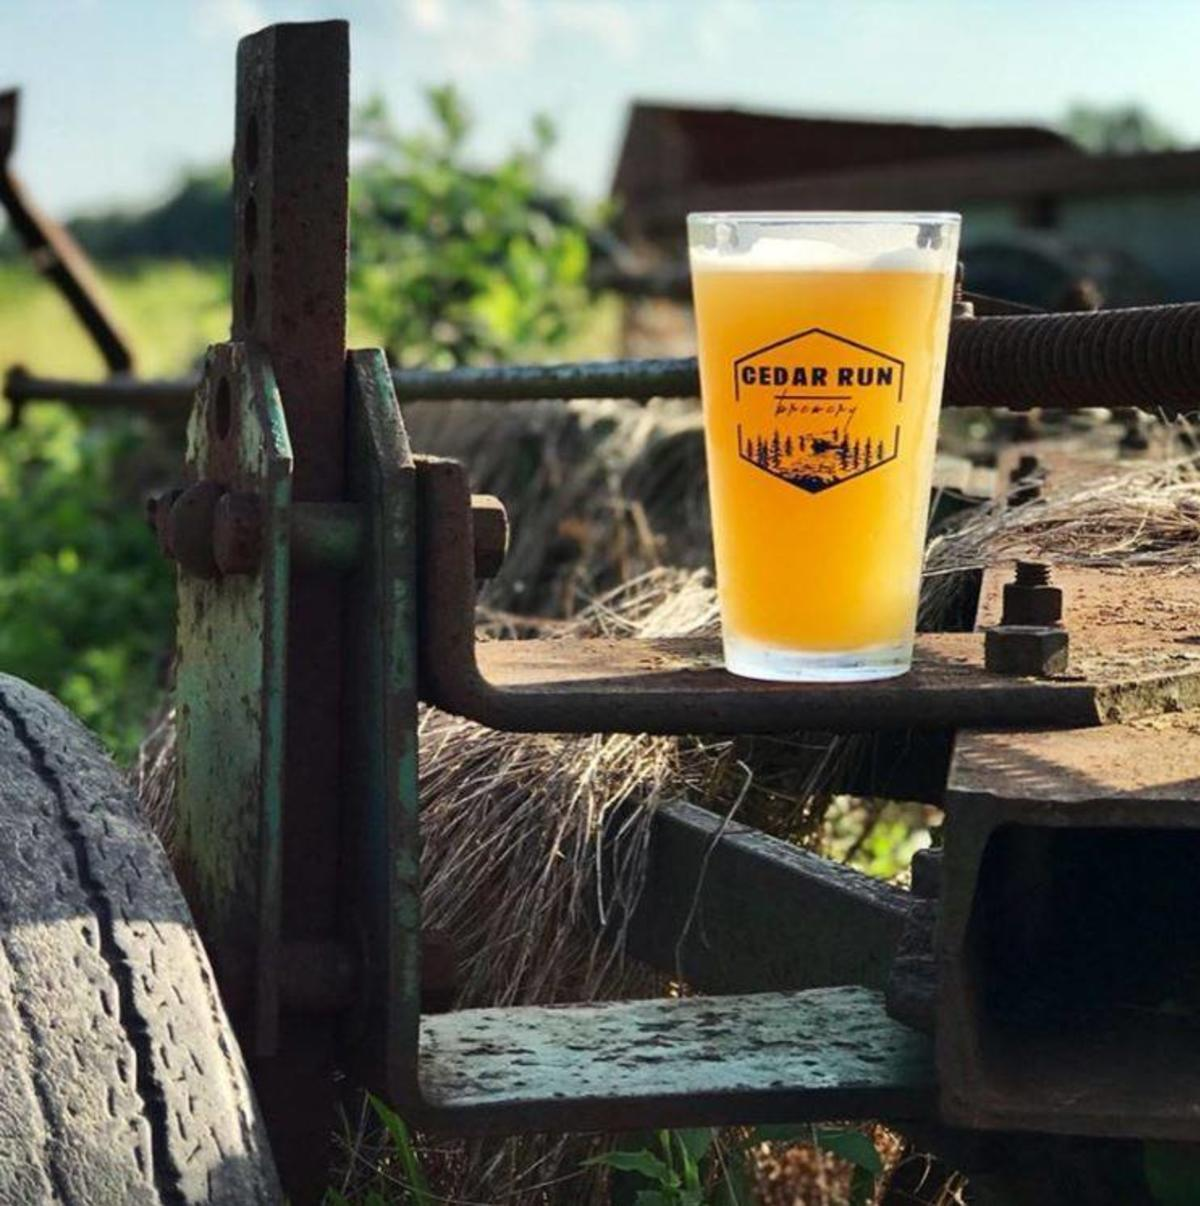 Cedar Run Brewery - full beer glass sitting on farm equipment